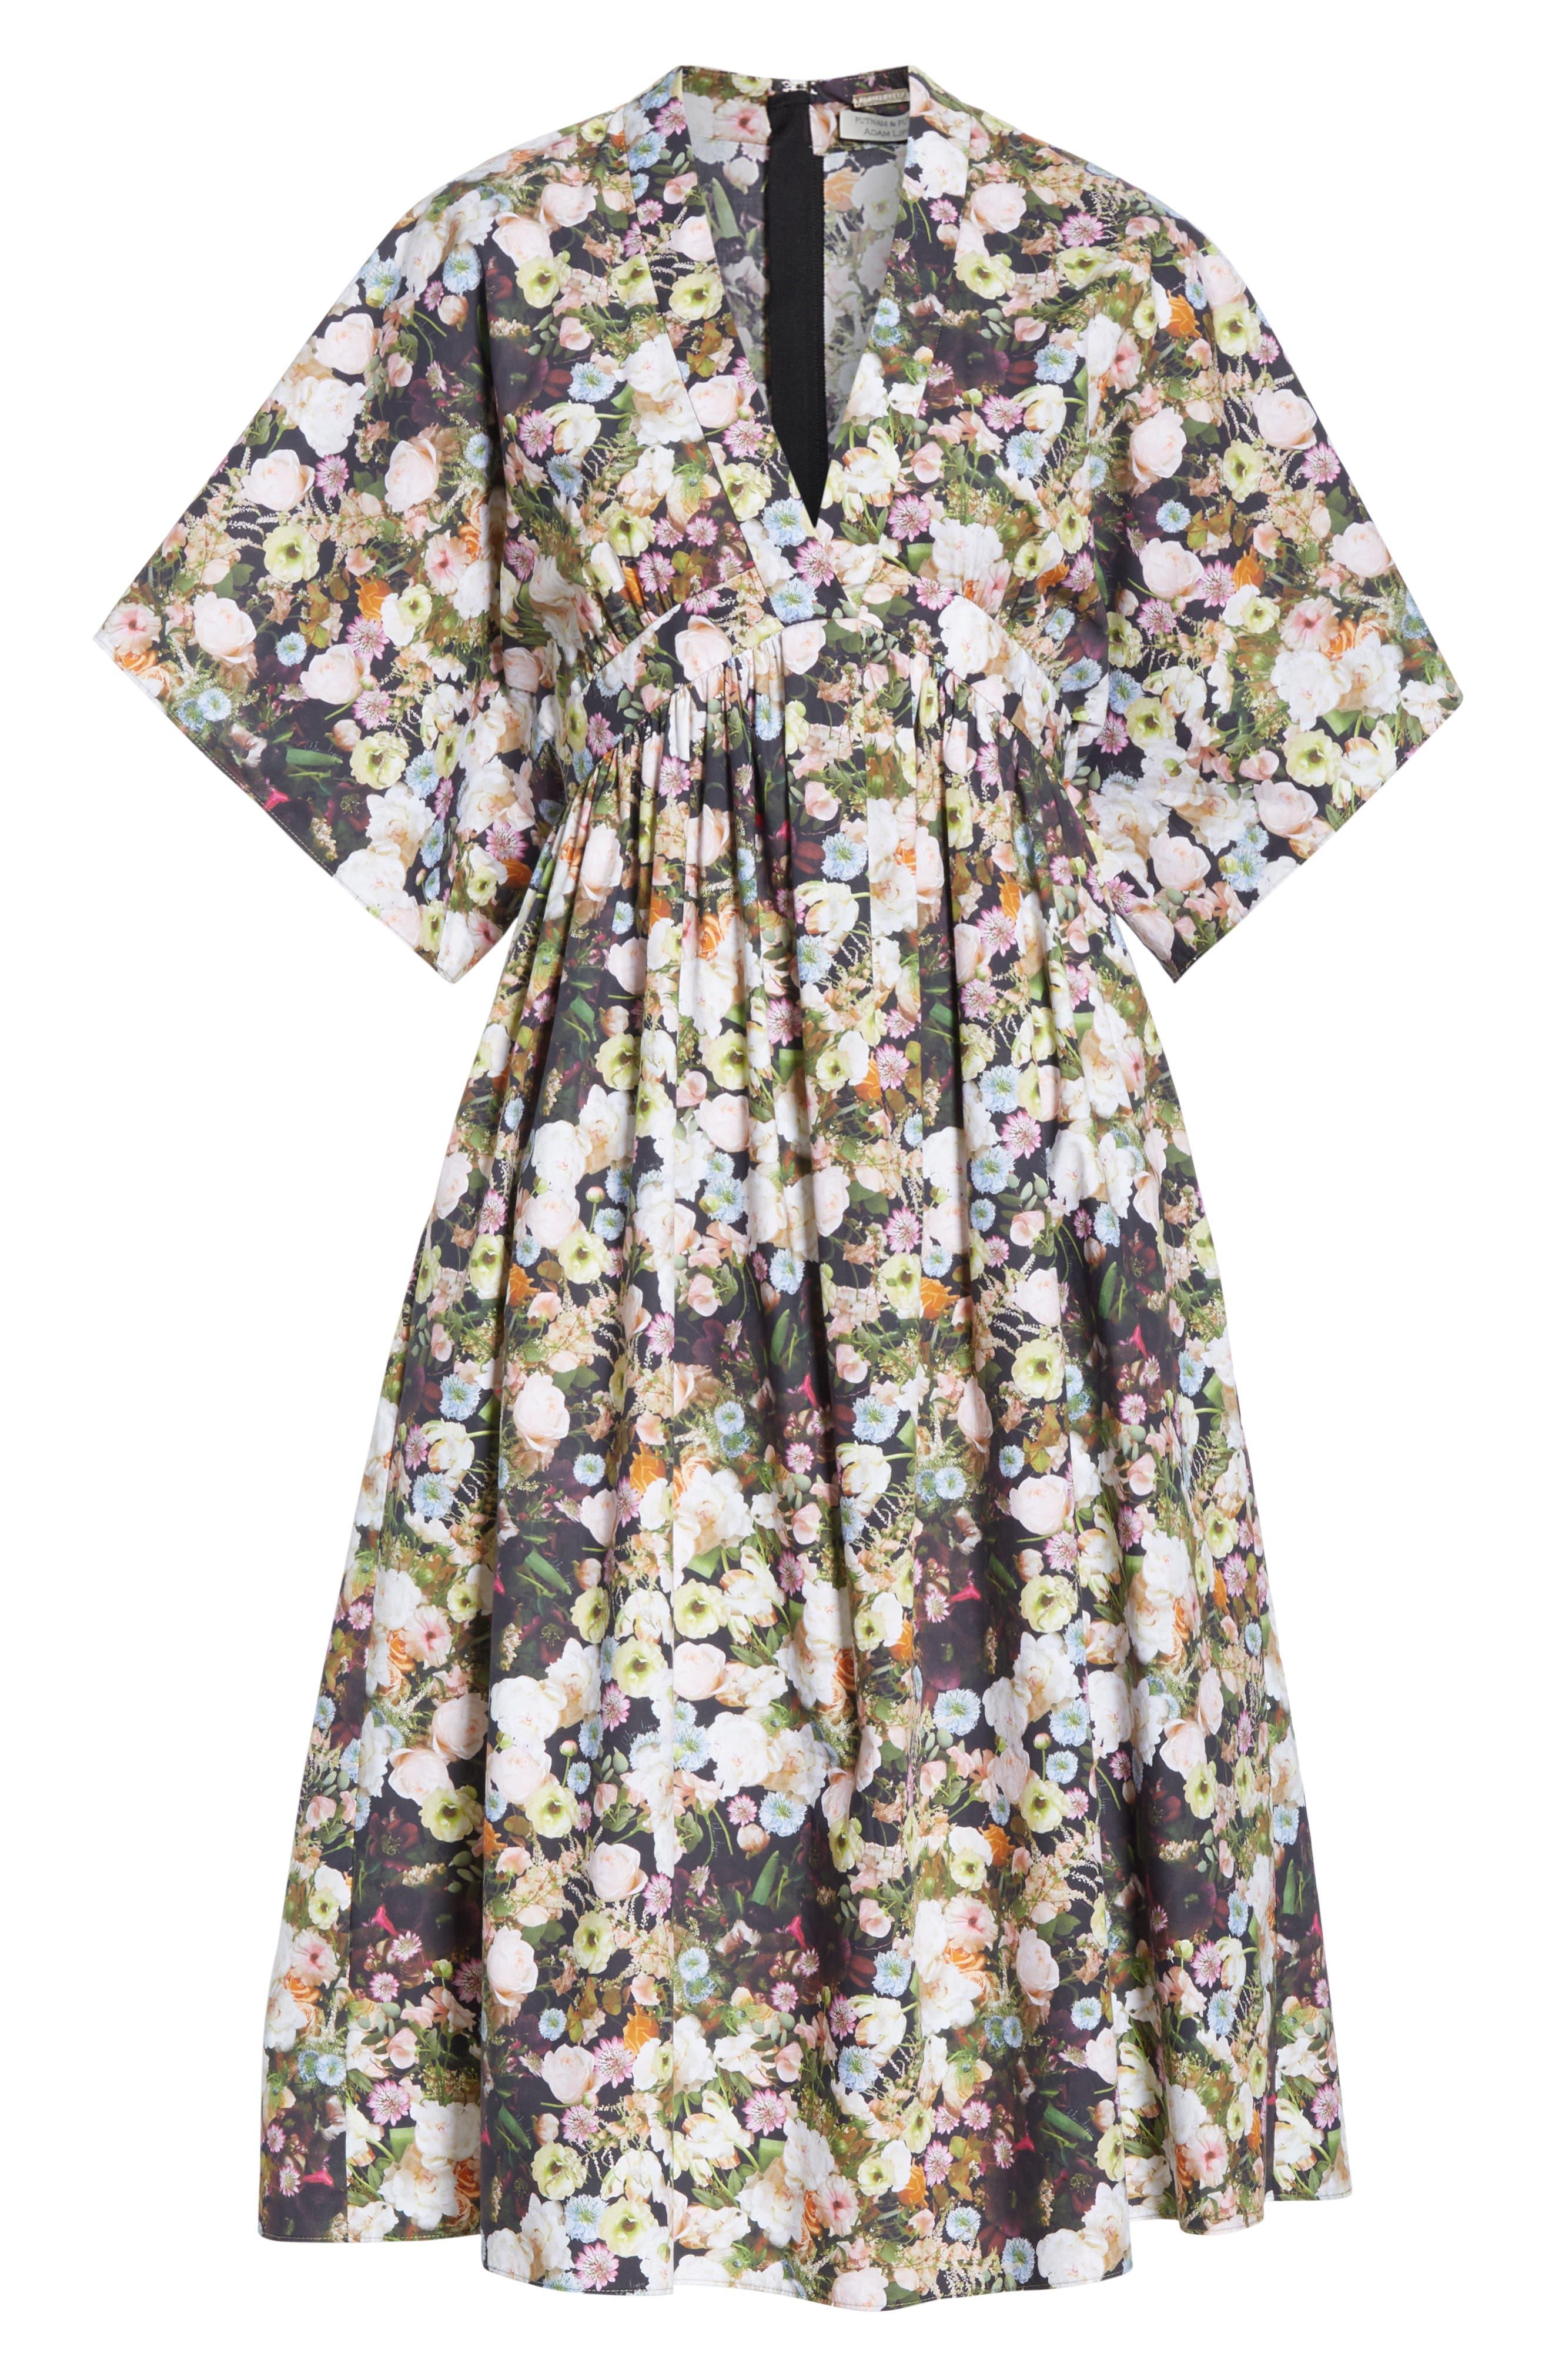 Floral Print Poplin Dress,                             Alternate thumbnail 6, color,                             BLACK FLORAL